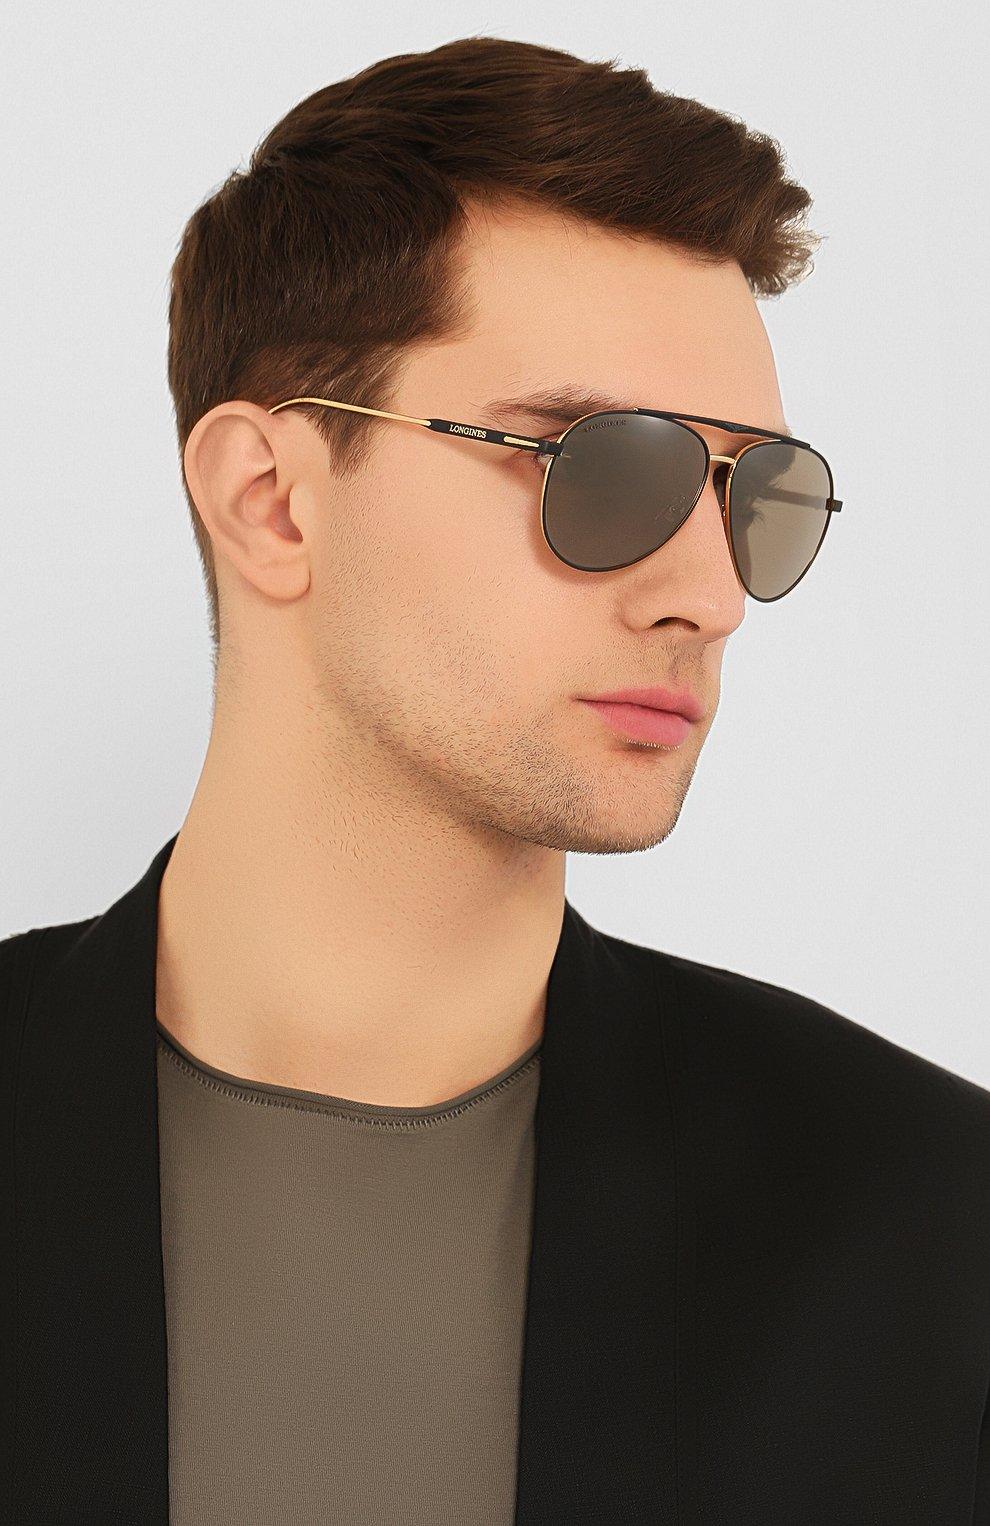 Мужские солнцезащитные очки LONGINES черного цвета, арт. LG0005-H 02L | Фото 2 (Тип очков: С/з; Очки форма: Авиаторы; Оптика Гендер: оптика-мужское)